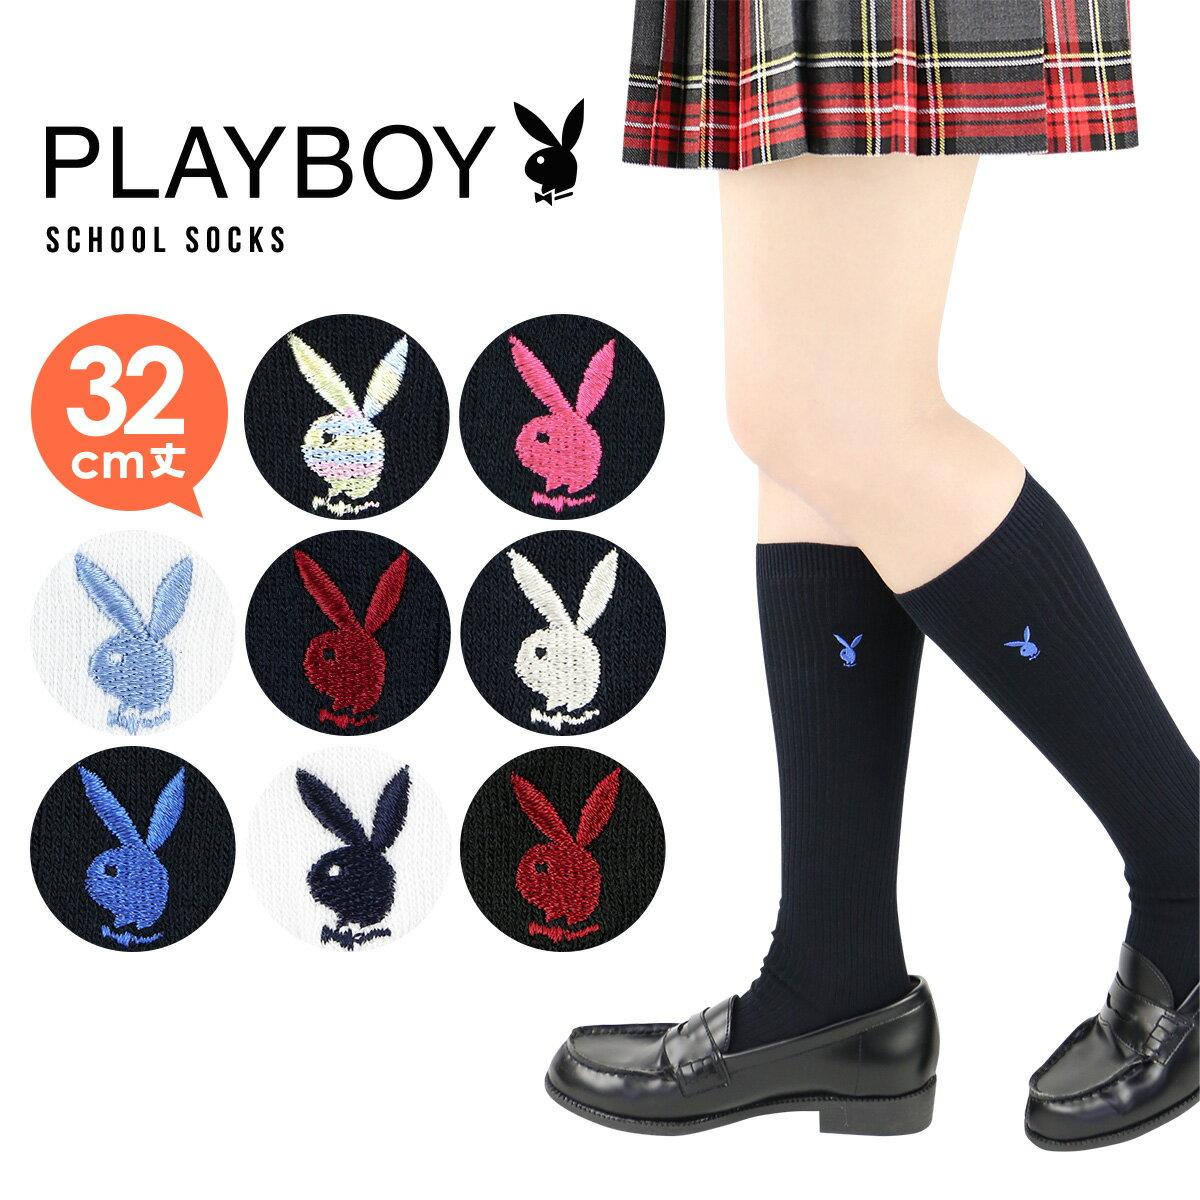 PLAYBOY (プレイボーイ) スクールソックス ワンポイント 両面刺繍 32cm丈 レディス ハイソックス 靴下 3737-353ポイント10倍